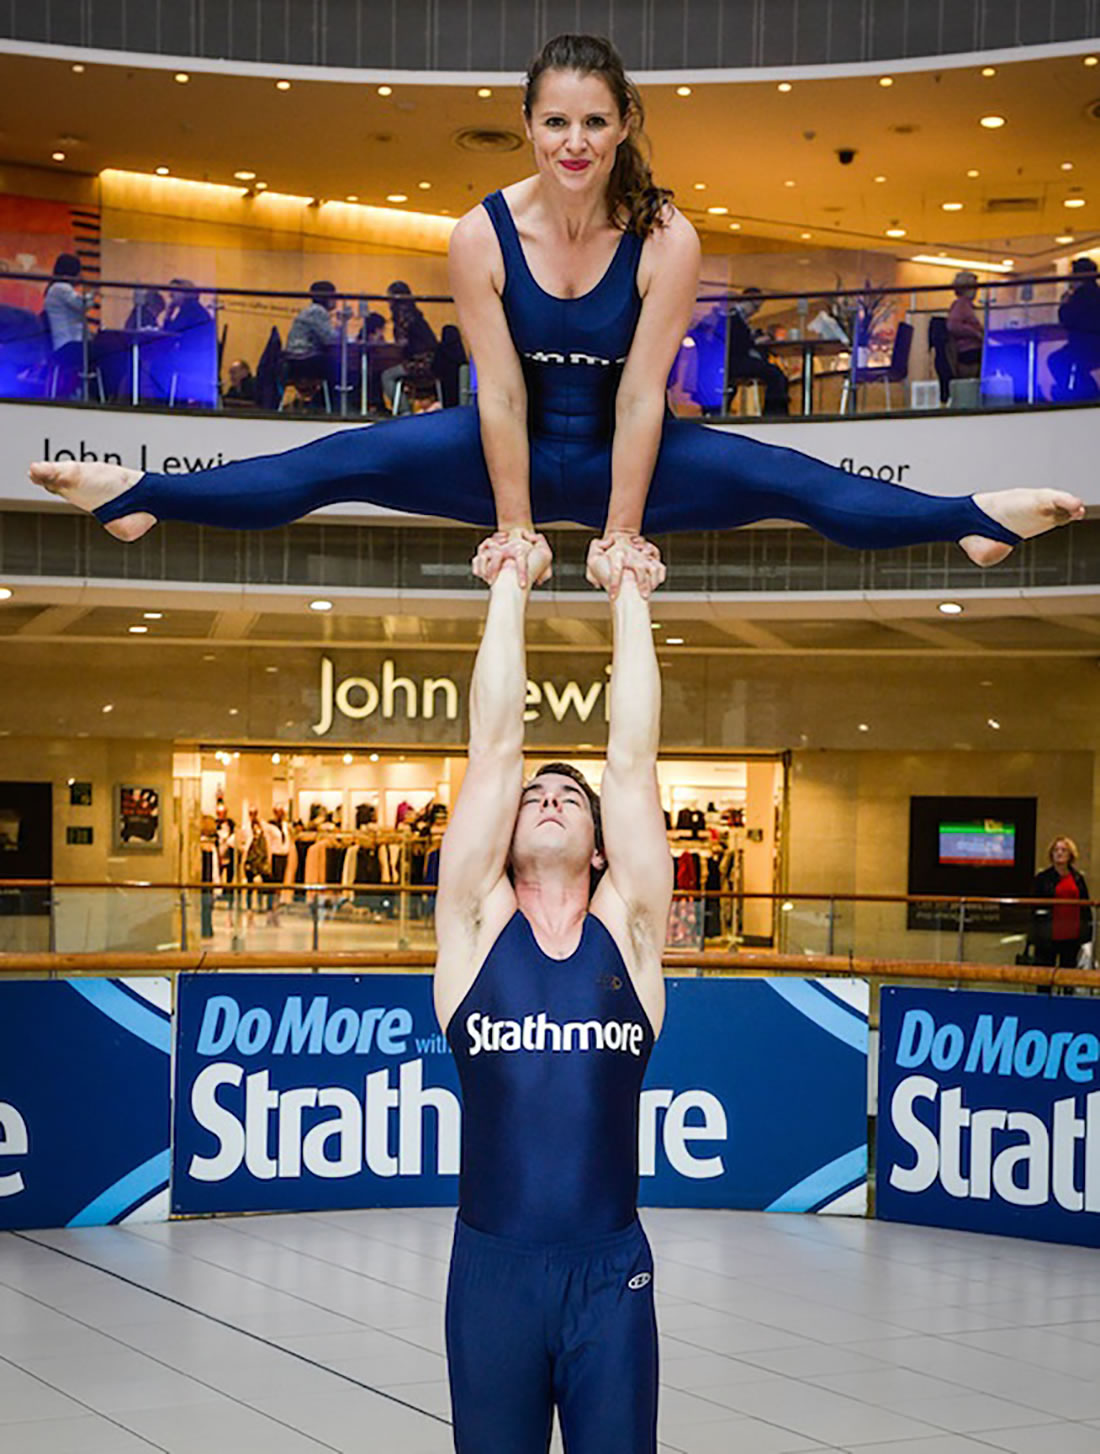 Bespoke Marketing - Gallery - Strathmore launch 2